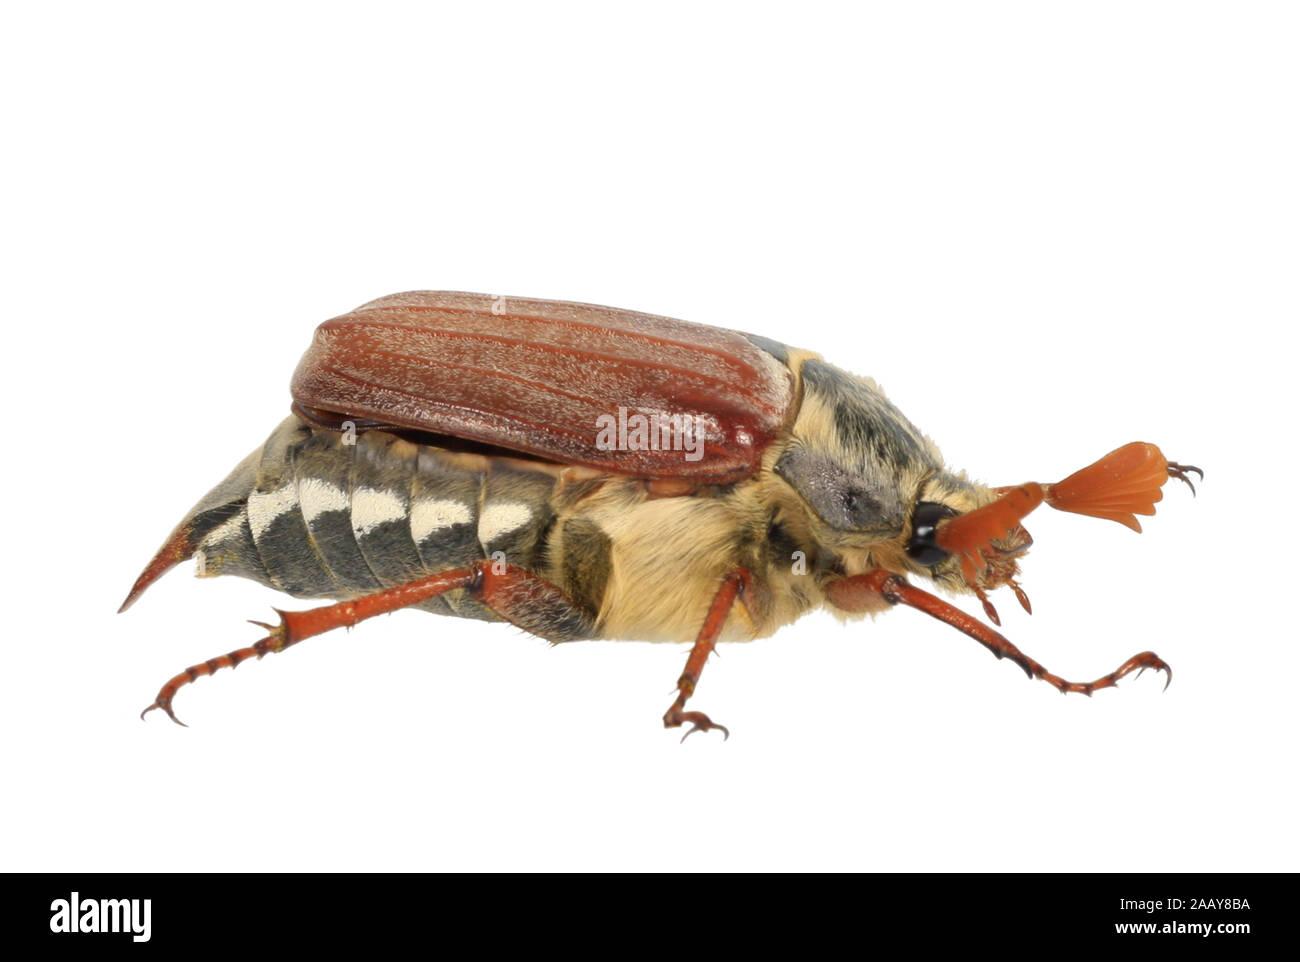 Maikaefer, Feldmaikaefer (Melolontha melolontha), Deutschland | common cockchafer, maybug (Melolontha melolontha), Germany | BLWS080812.jpg [ (c) blic Stock Photo